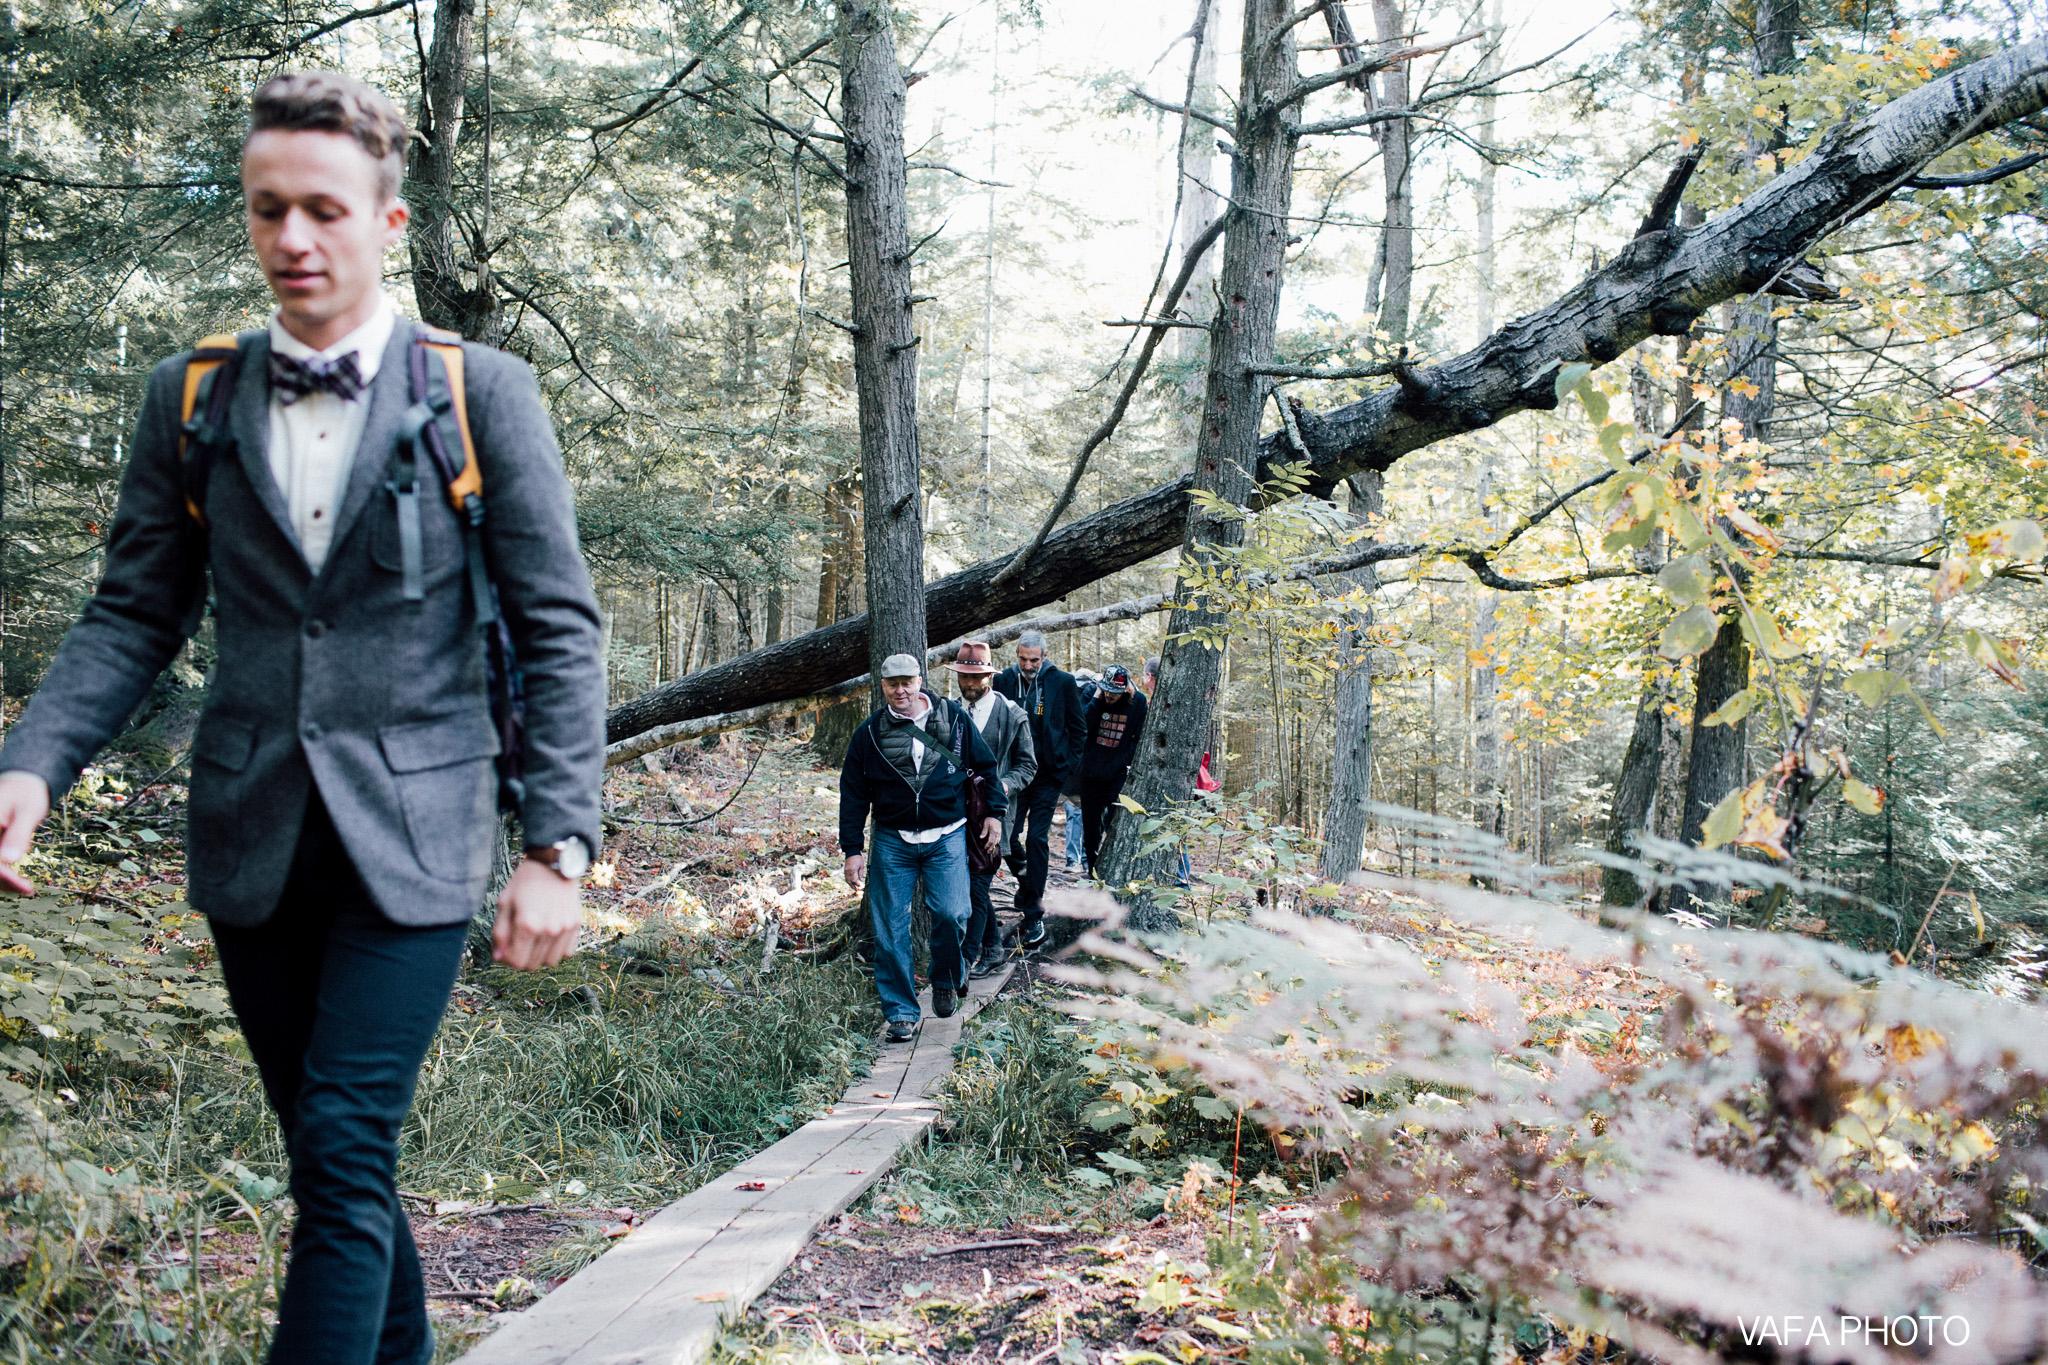 Hogback-Mountain-Wedding-Chelsea-Josh-Vafa-Photo-122.jpg